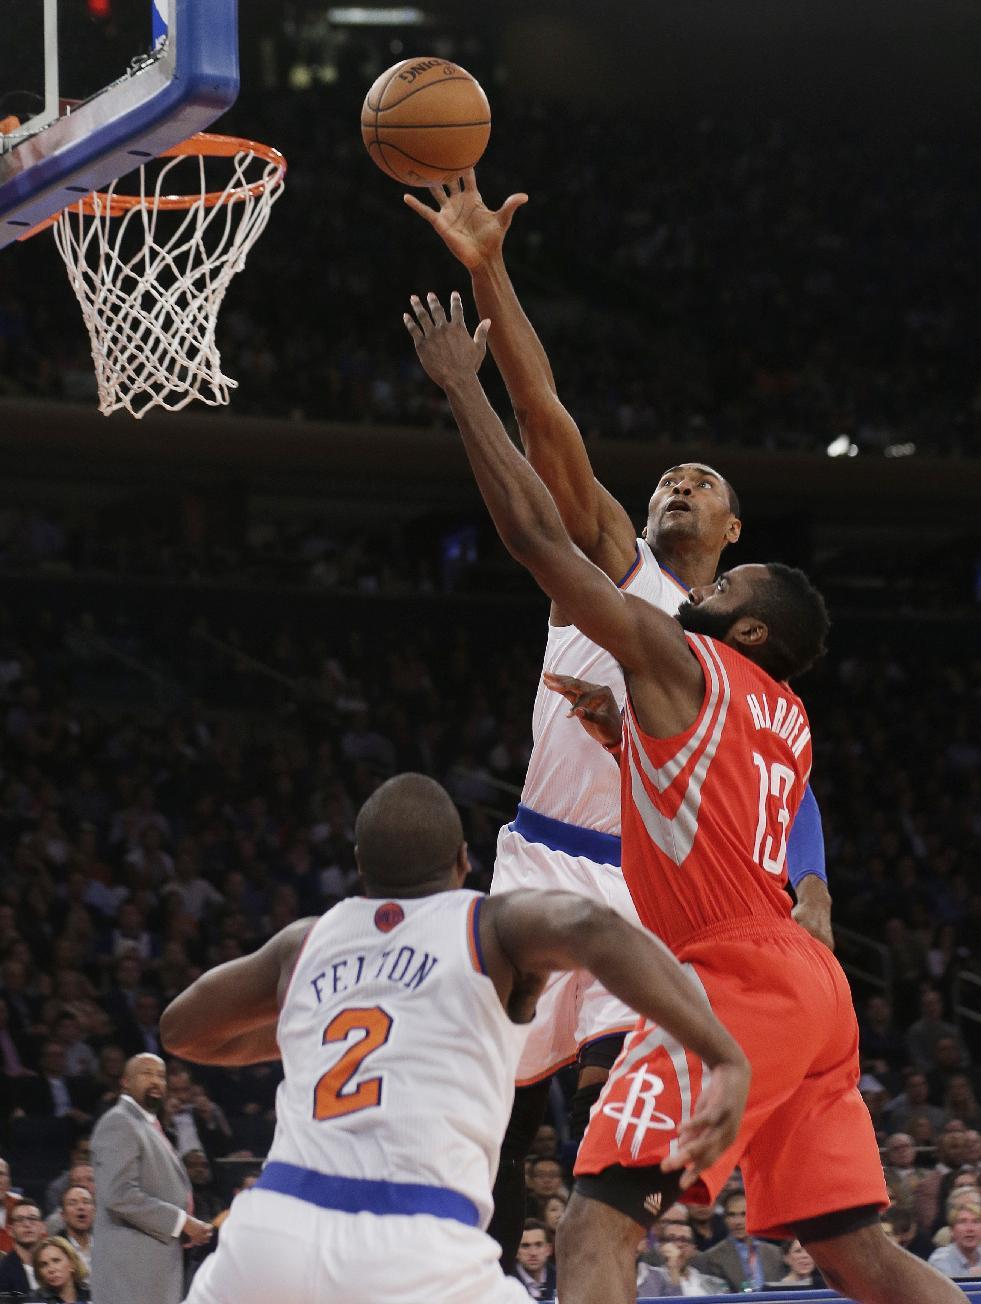 New York Knicks' Metta World Peace blocks a shot by Houston Rockets' James Harden, right, as Knicks' Raymond Felton, left, defends during the second half of an NBA basketball game Thursday, Nov. 14, 2013, in New York. The Rockets won 109-106